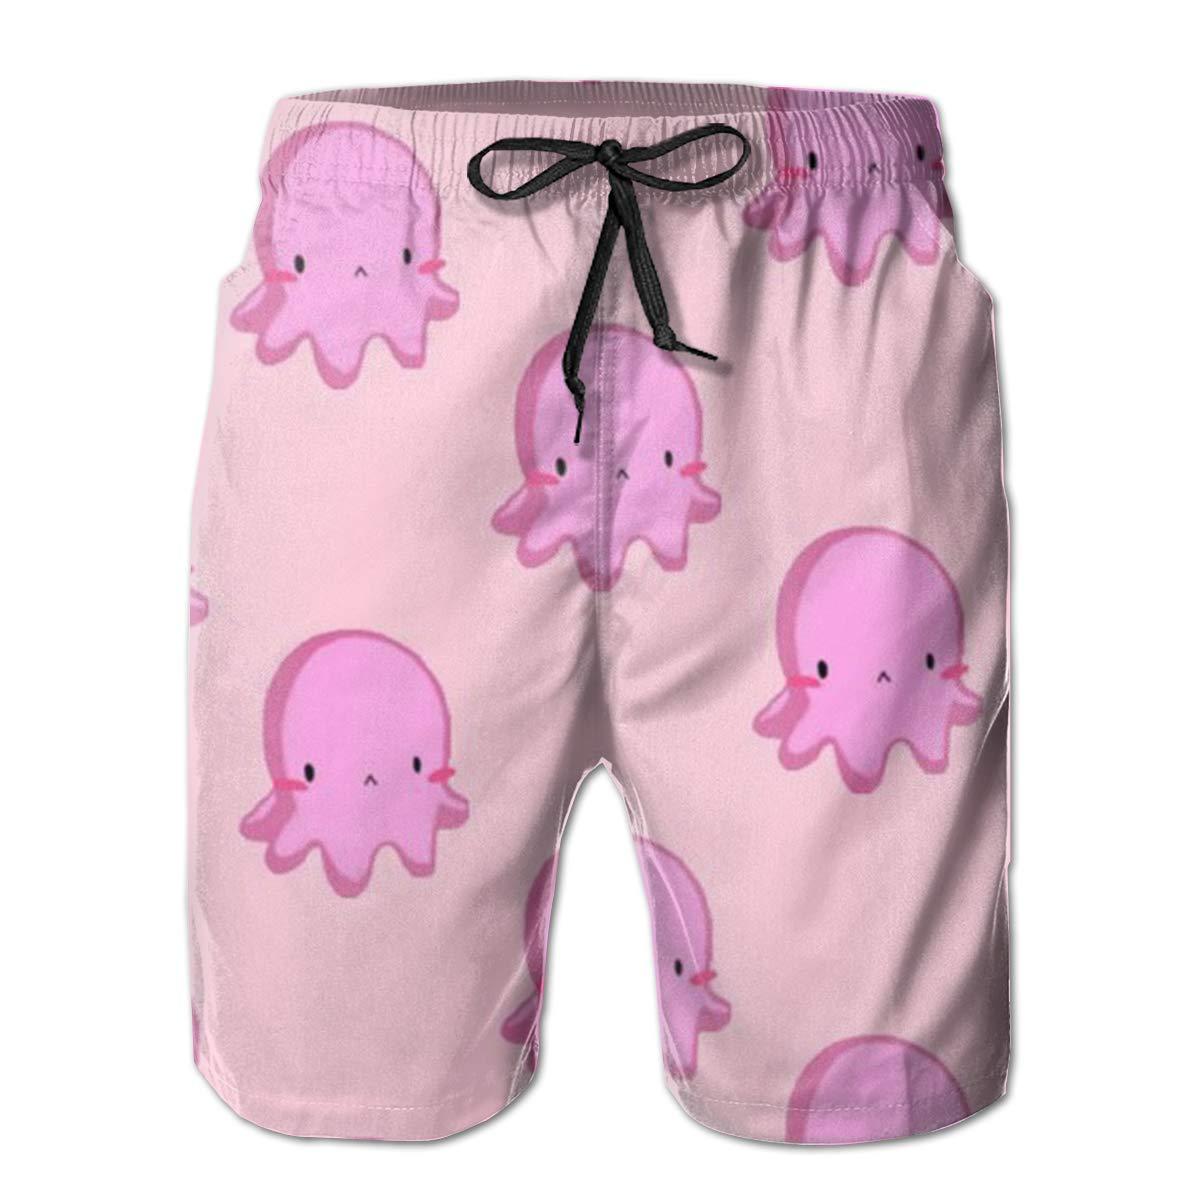 Mens Swim Trunks Octopus Quick Dry Board Shorts Bathing Suits Swimwear Volley Beach Trunks